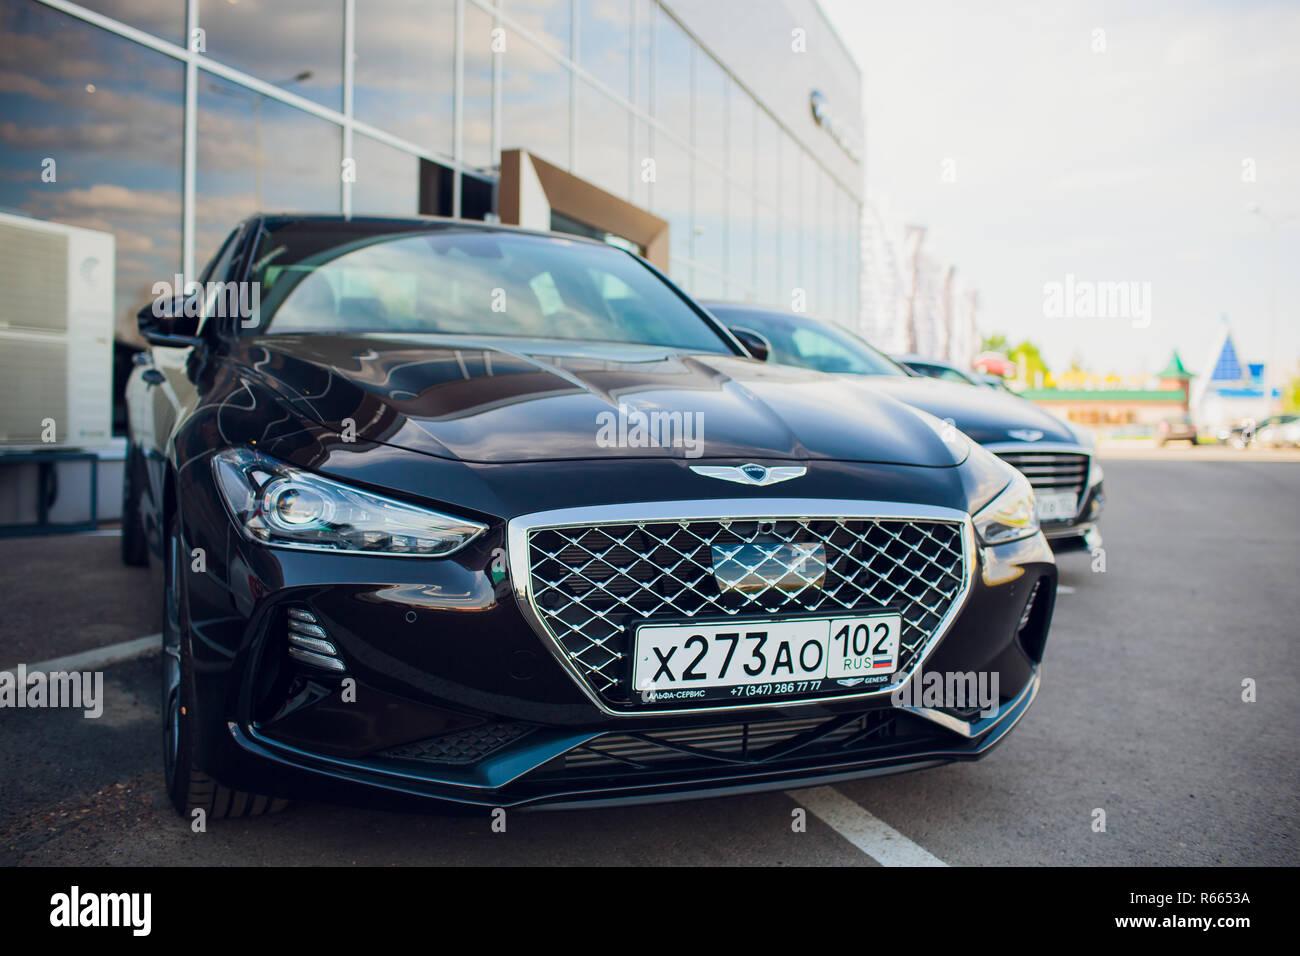 UFA, Russland - 23. Mai: Modell auto Genesis G70 Stockbild